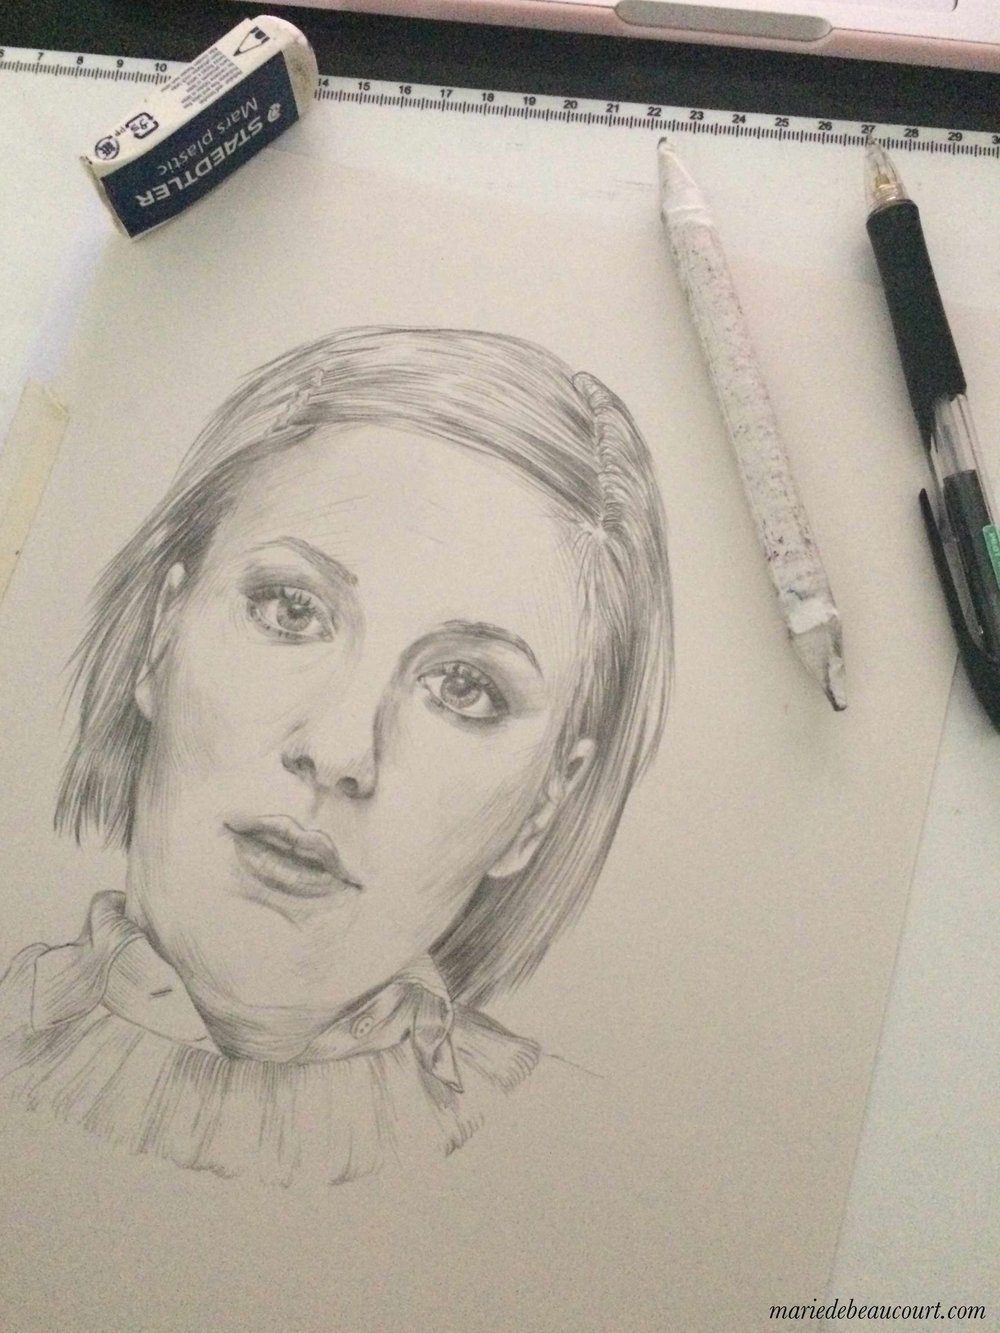 marie-de-beaucourt-illustration-portrait-work-in-progress-4.jpg